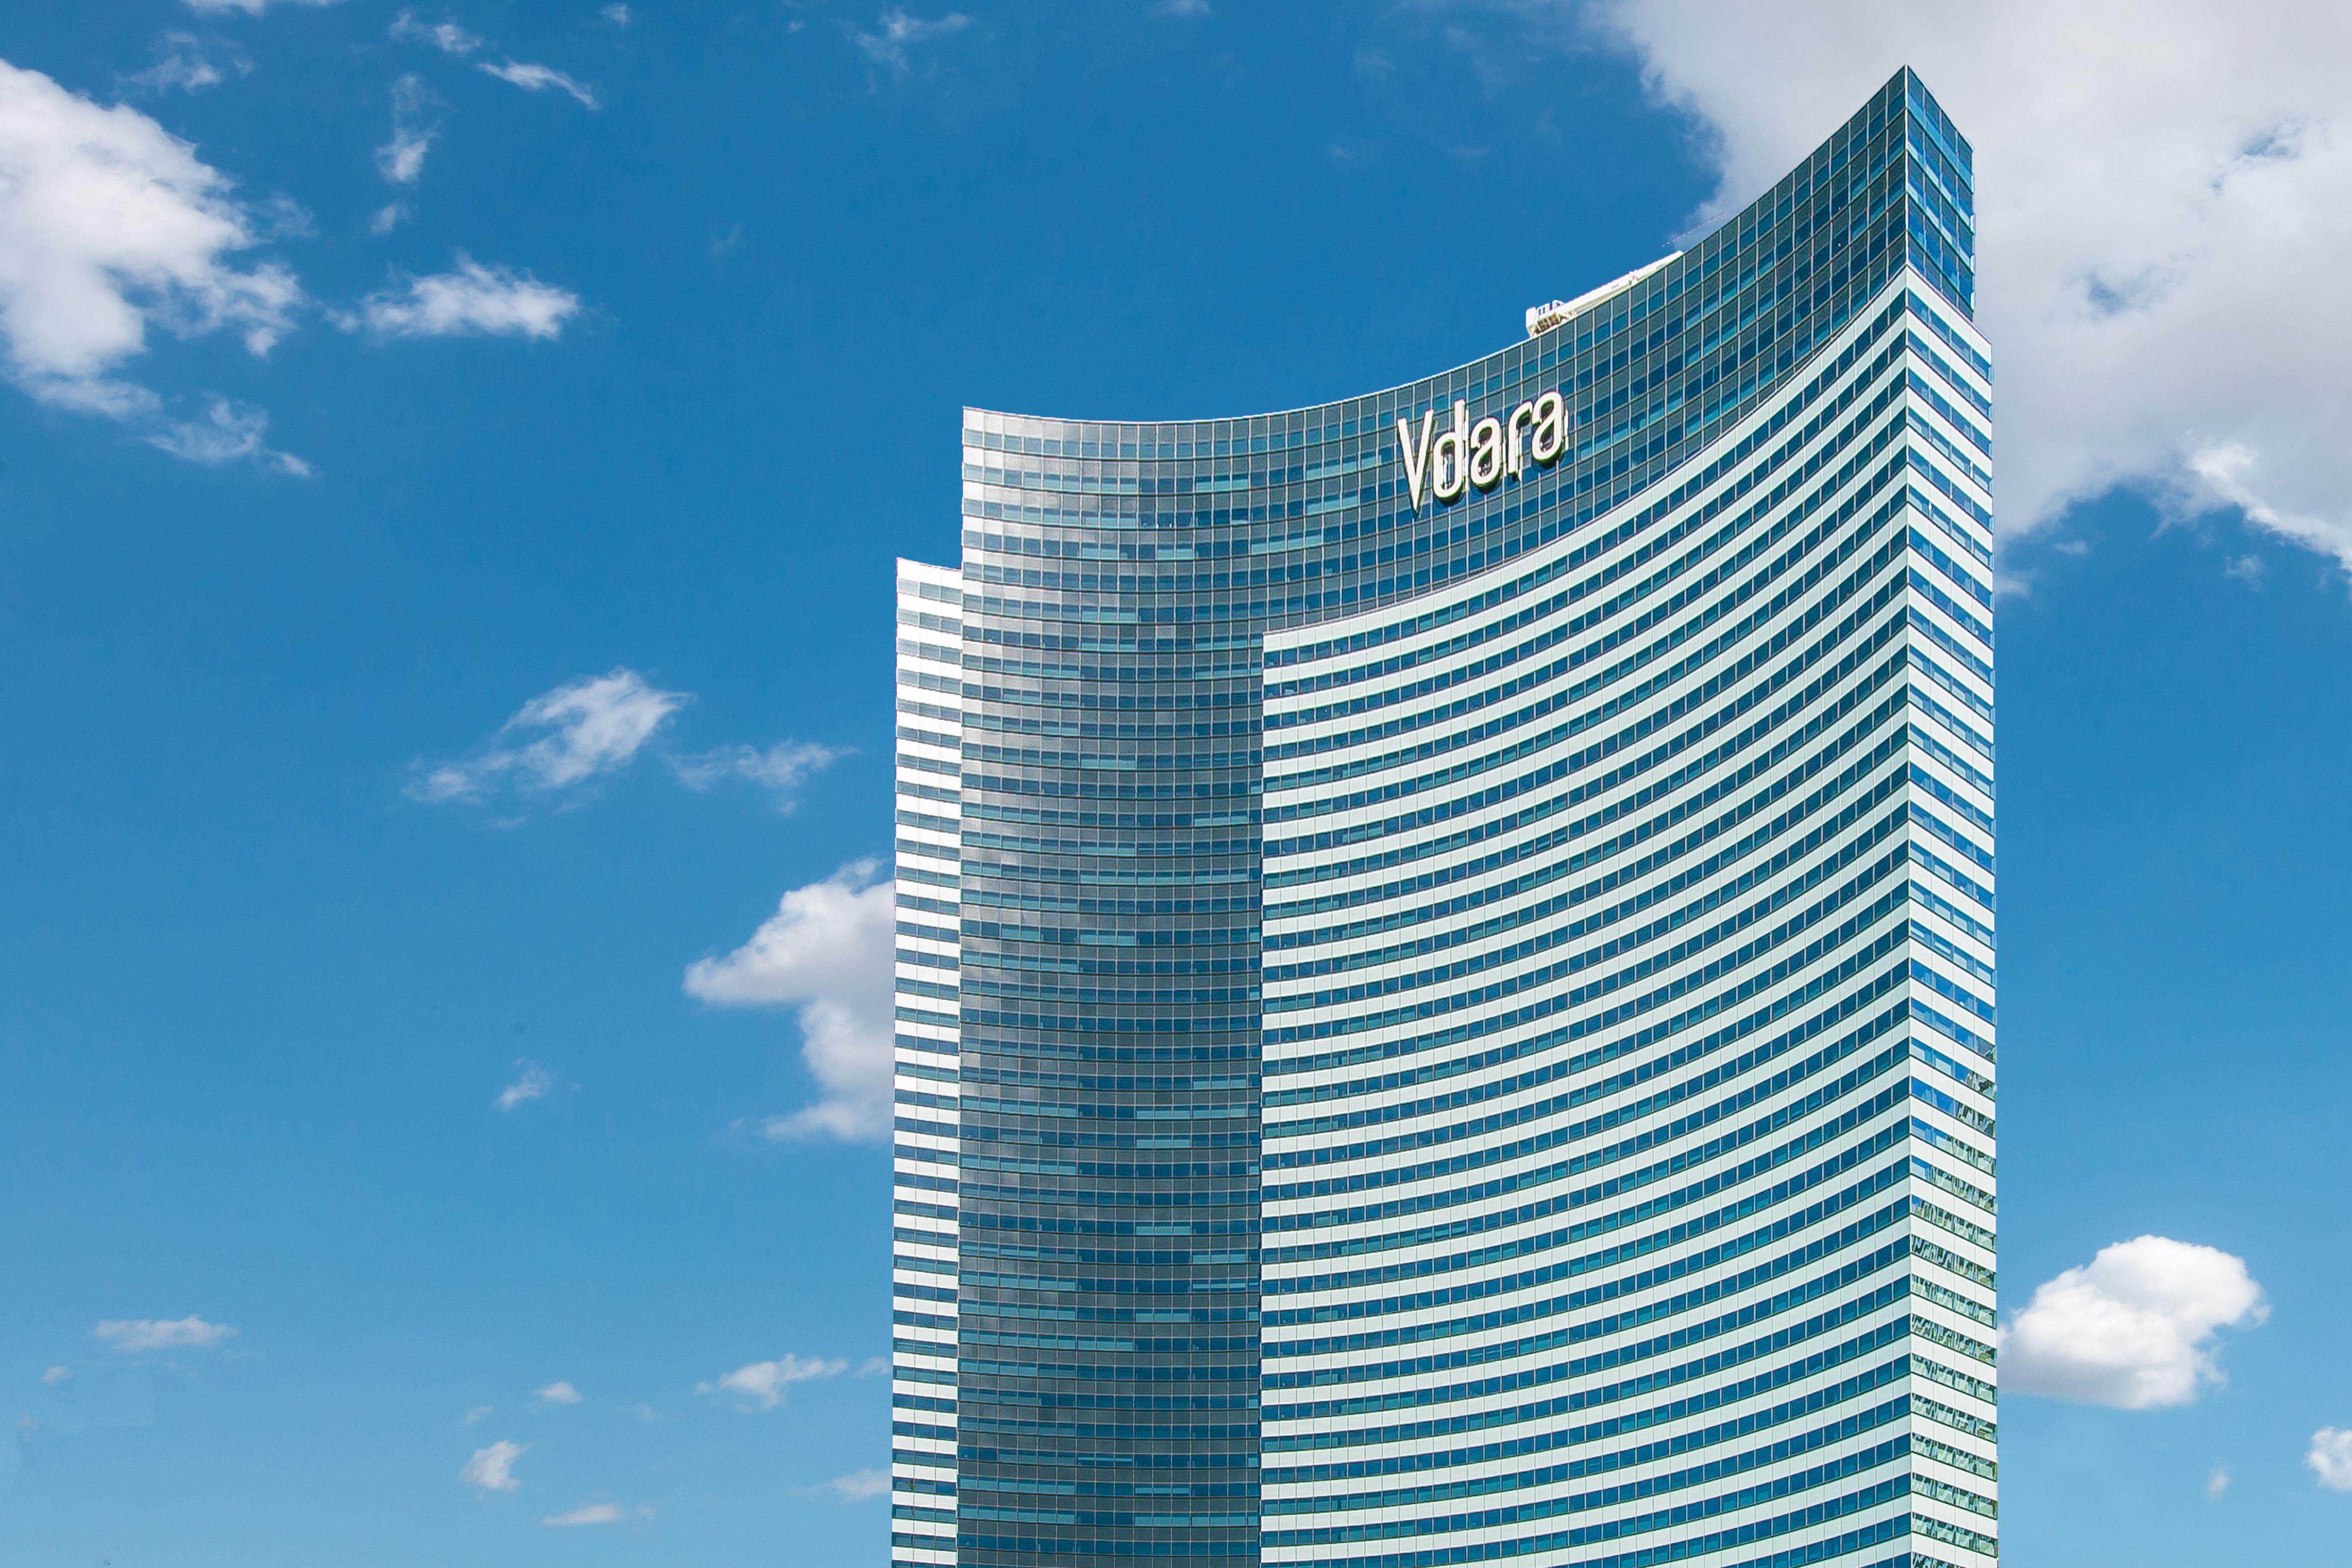 Las_Vegas_Vdara_Real_Estate_001a